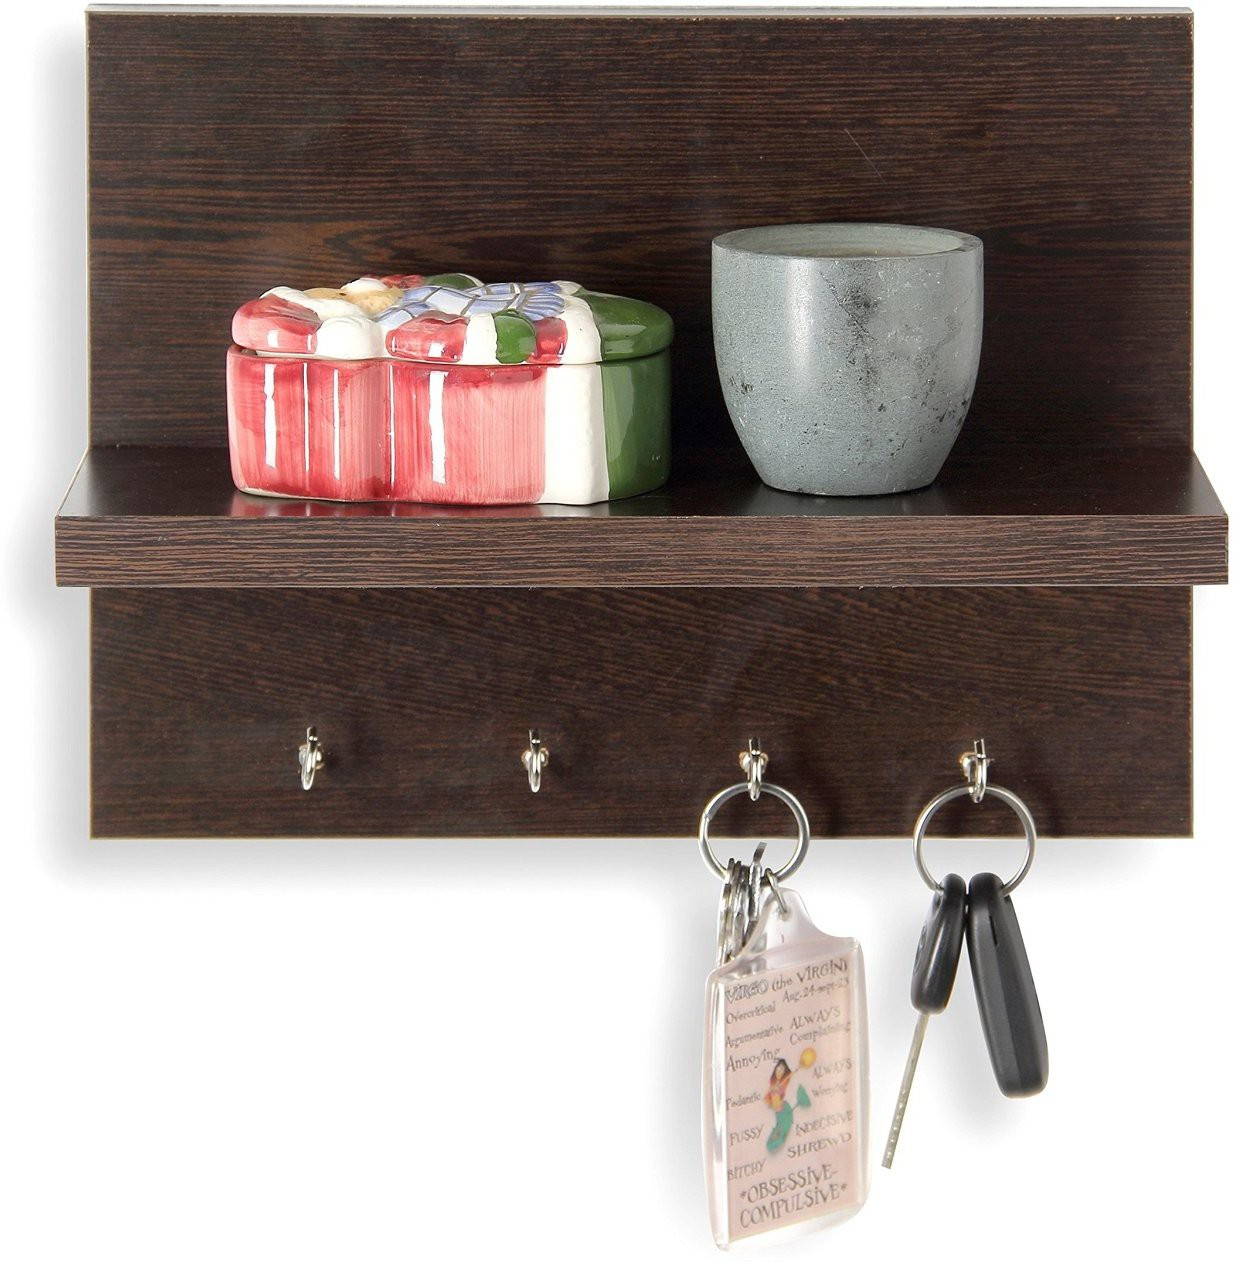 View Decorhand 4 Hooks Key holder Wooden Wall Shelf(Number of Shelves - 1, Brown) Furniture (Decorhand)